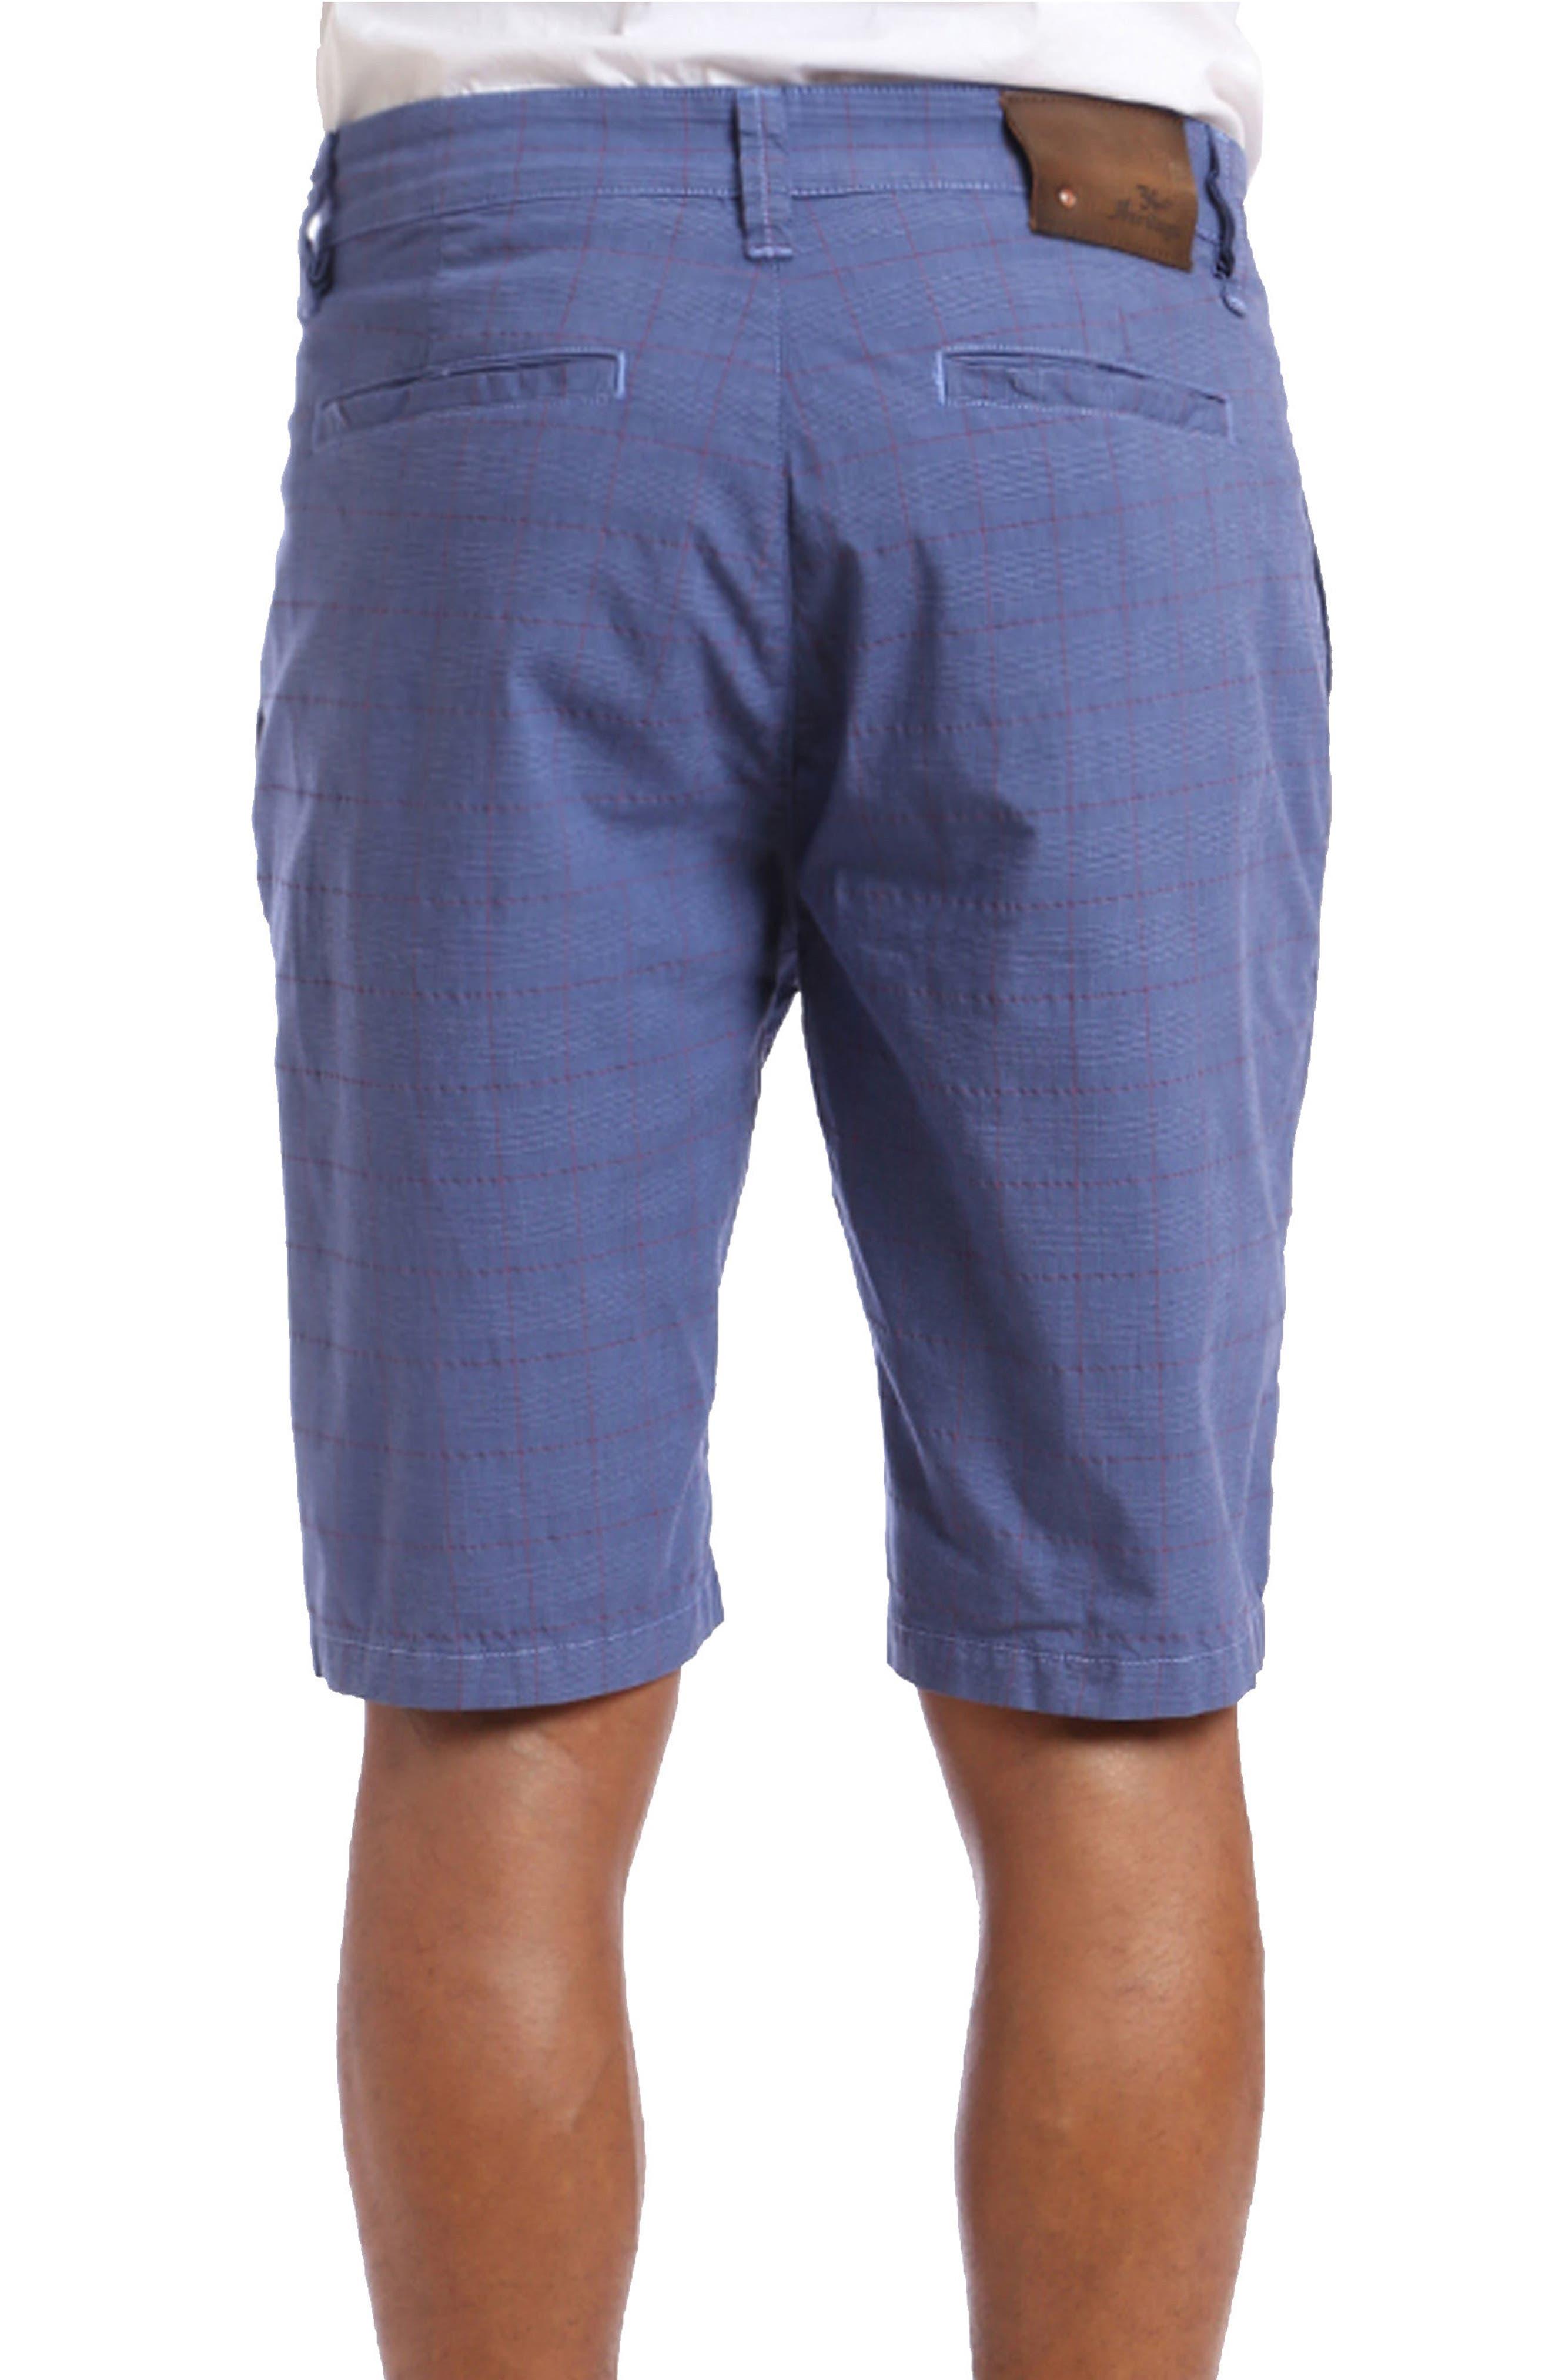 Nevada Twill Shorts,                             Alternate thumbnail 2, color,                             INDIGO PLAID